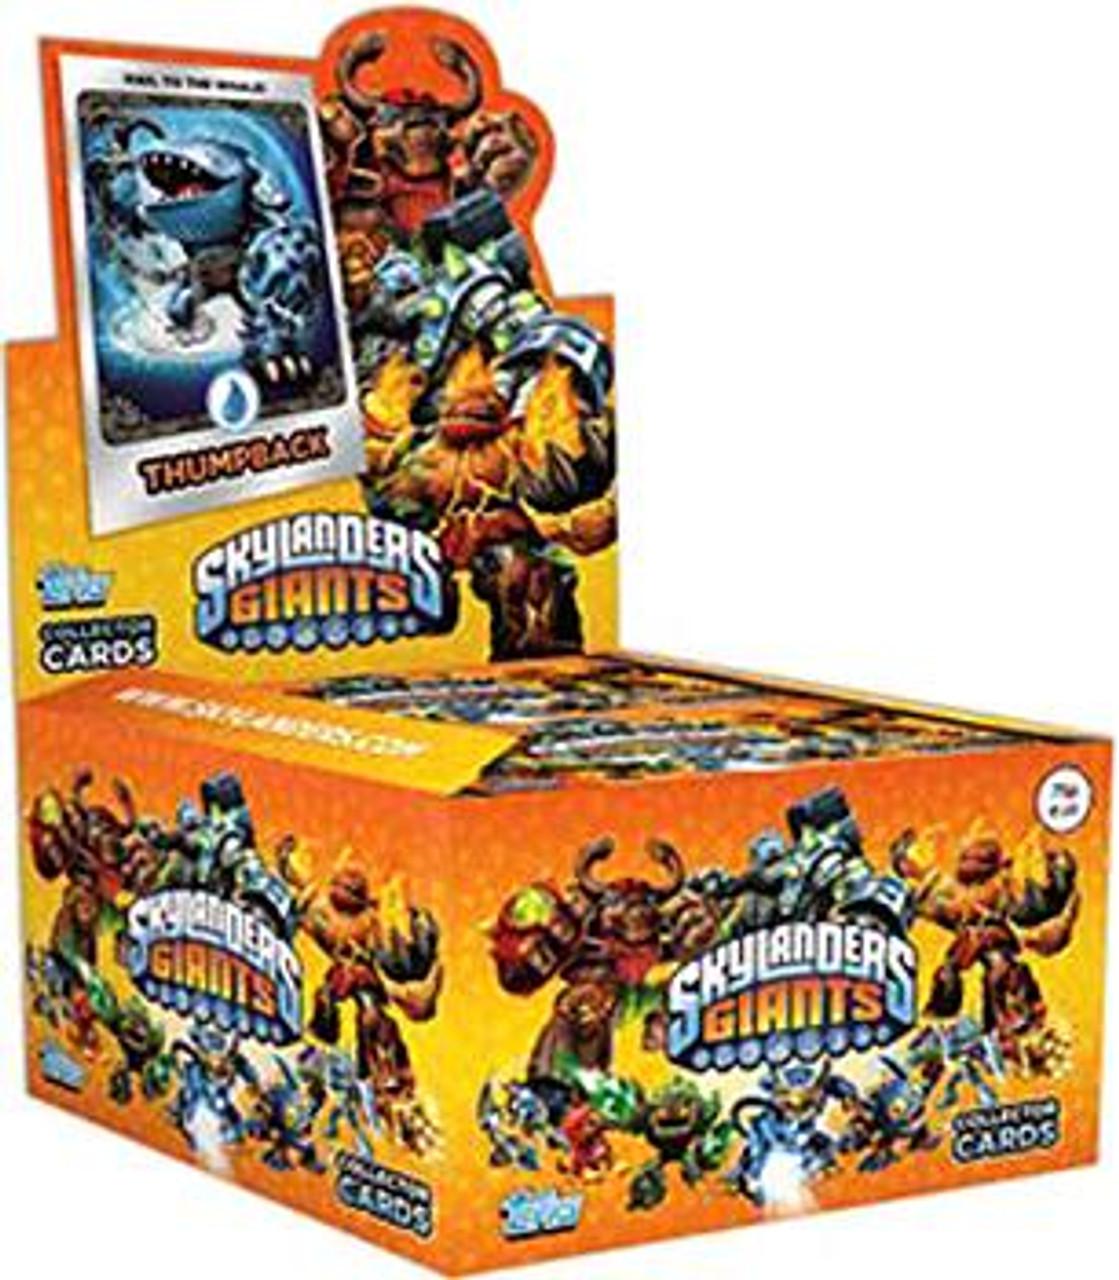 Skylanders Giants Trading Card Box